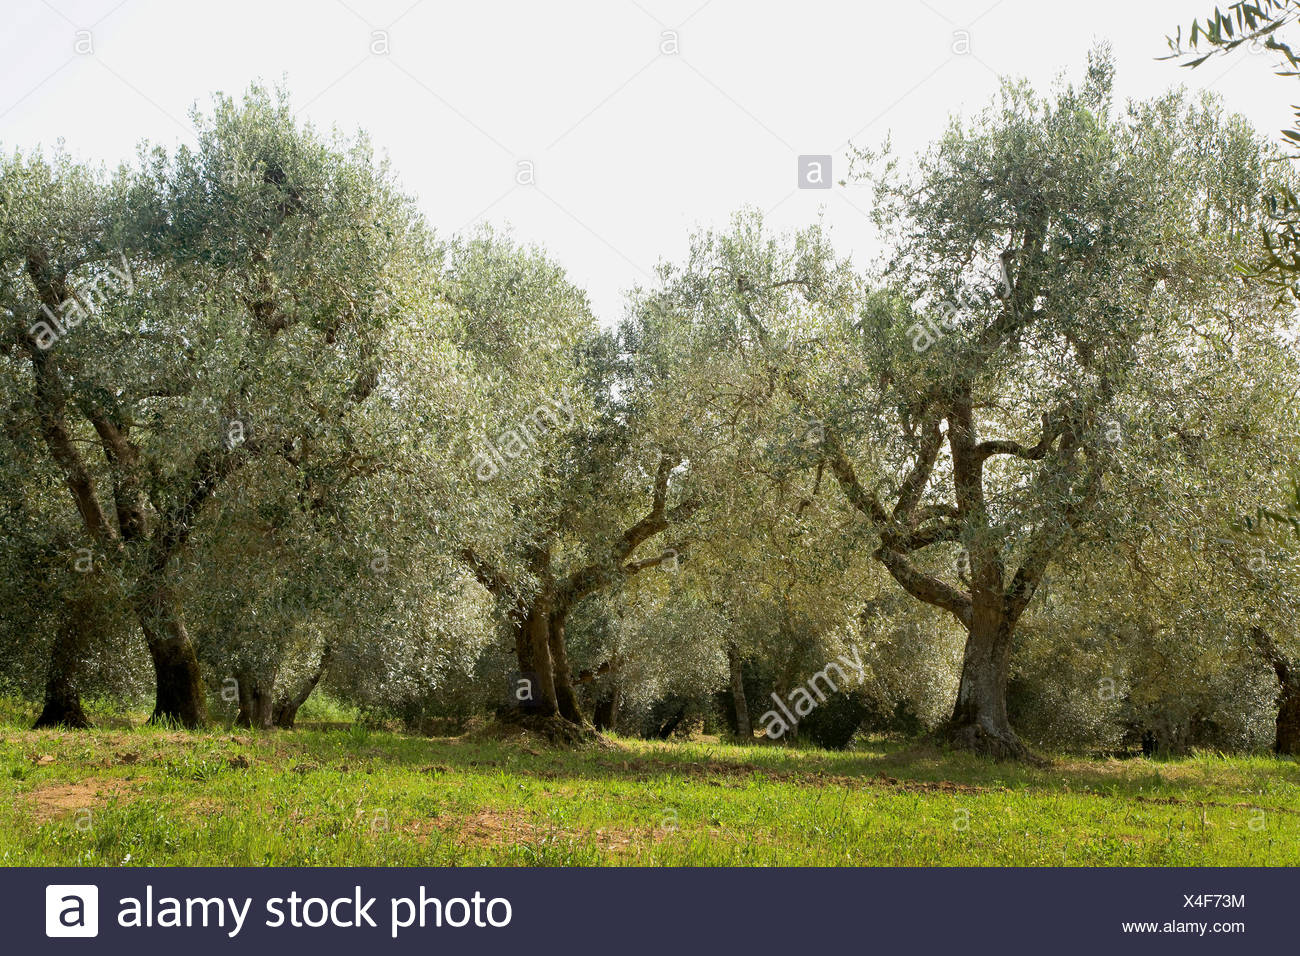 Kultur-Oelbaum, Kultur-Olivenbaum, Oelbaum, Olivenbaum (Olea europaea ssp. sativa), alte Olivenbaeume in der Toskana, Italien, T Stock Photo